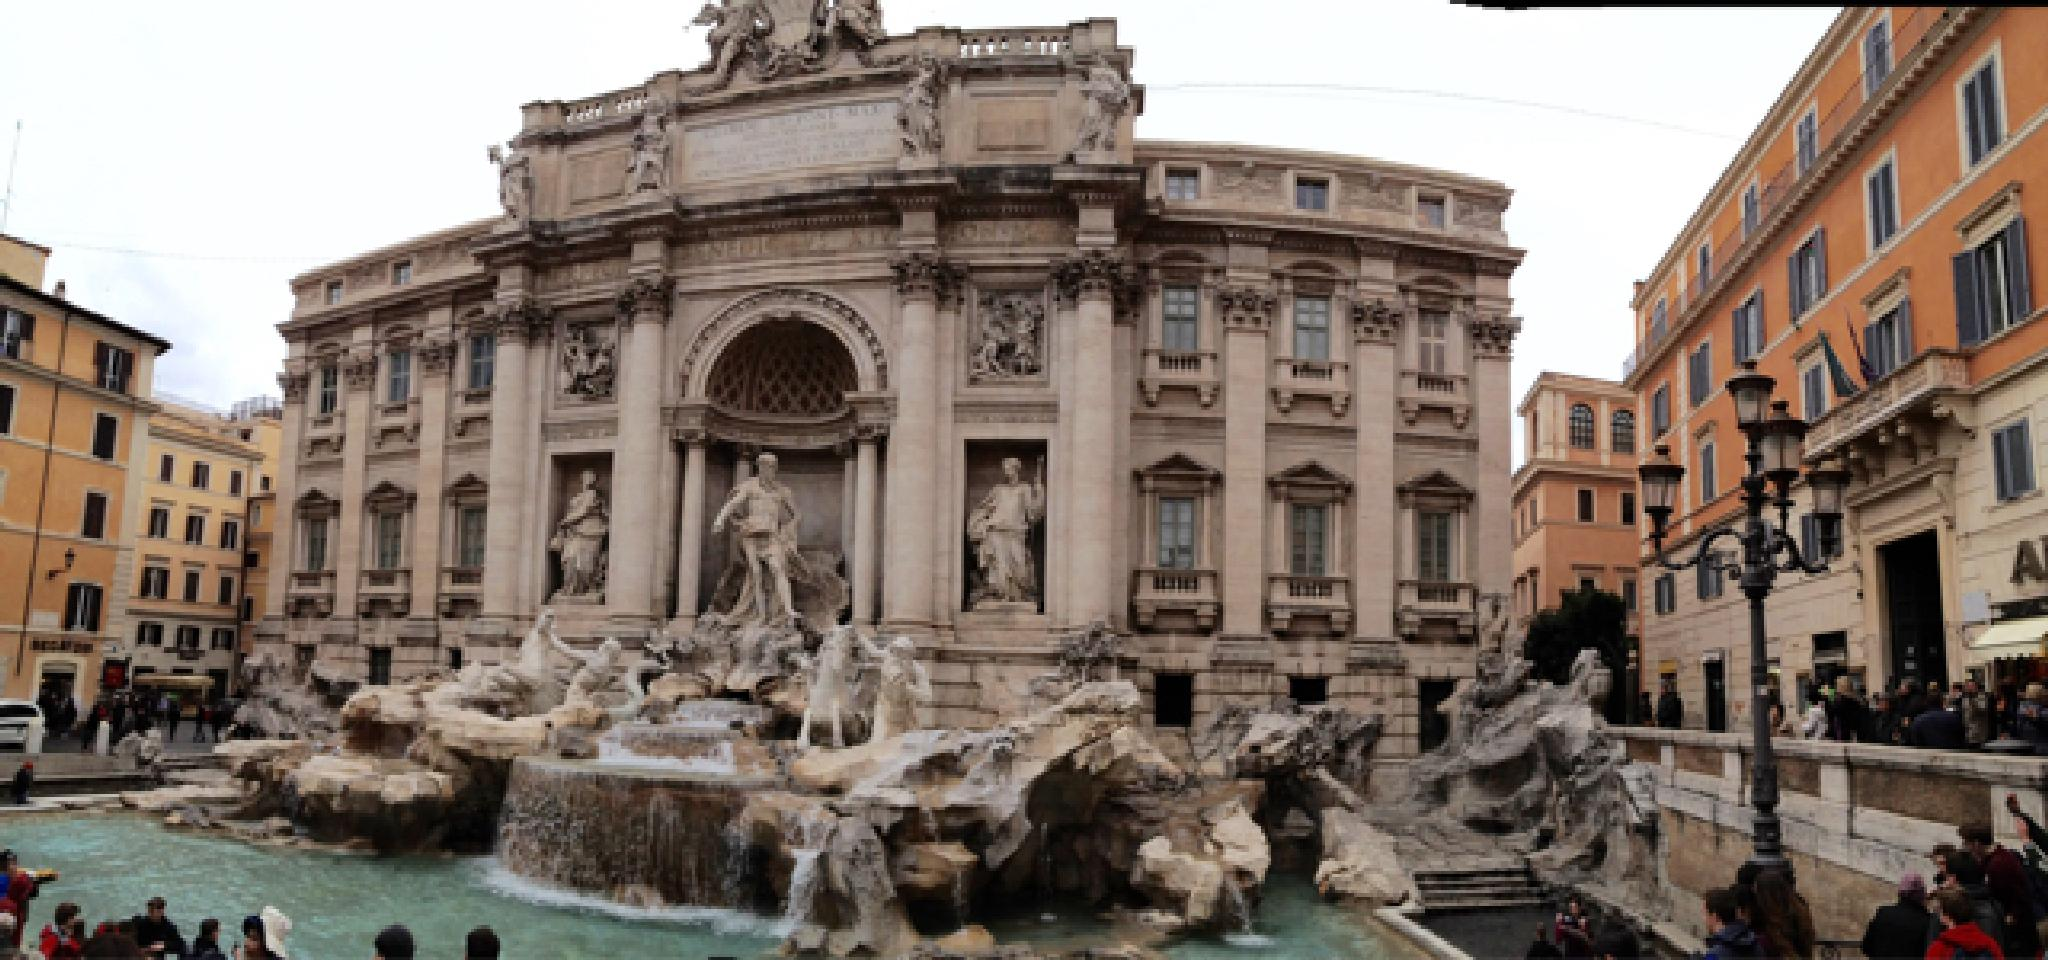 Trevi Fountain by audreychui